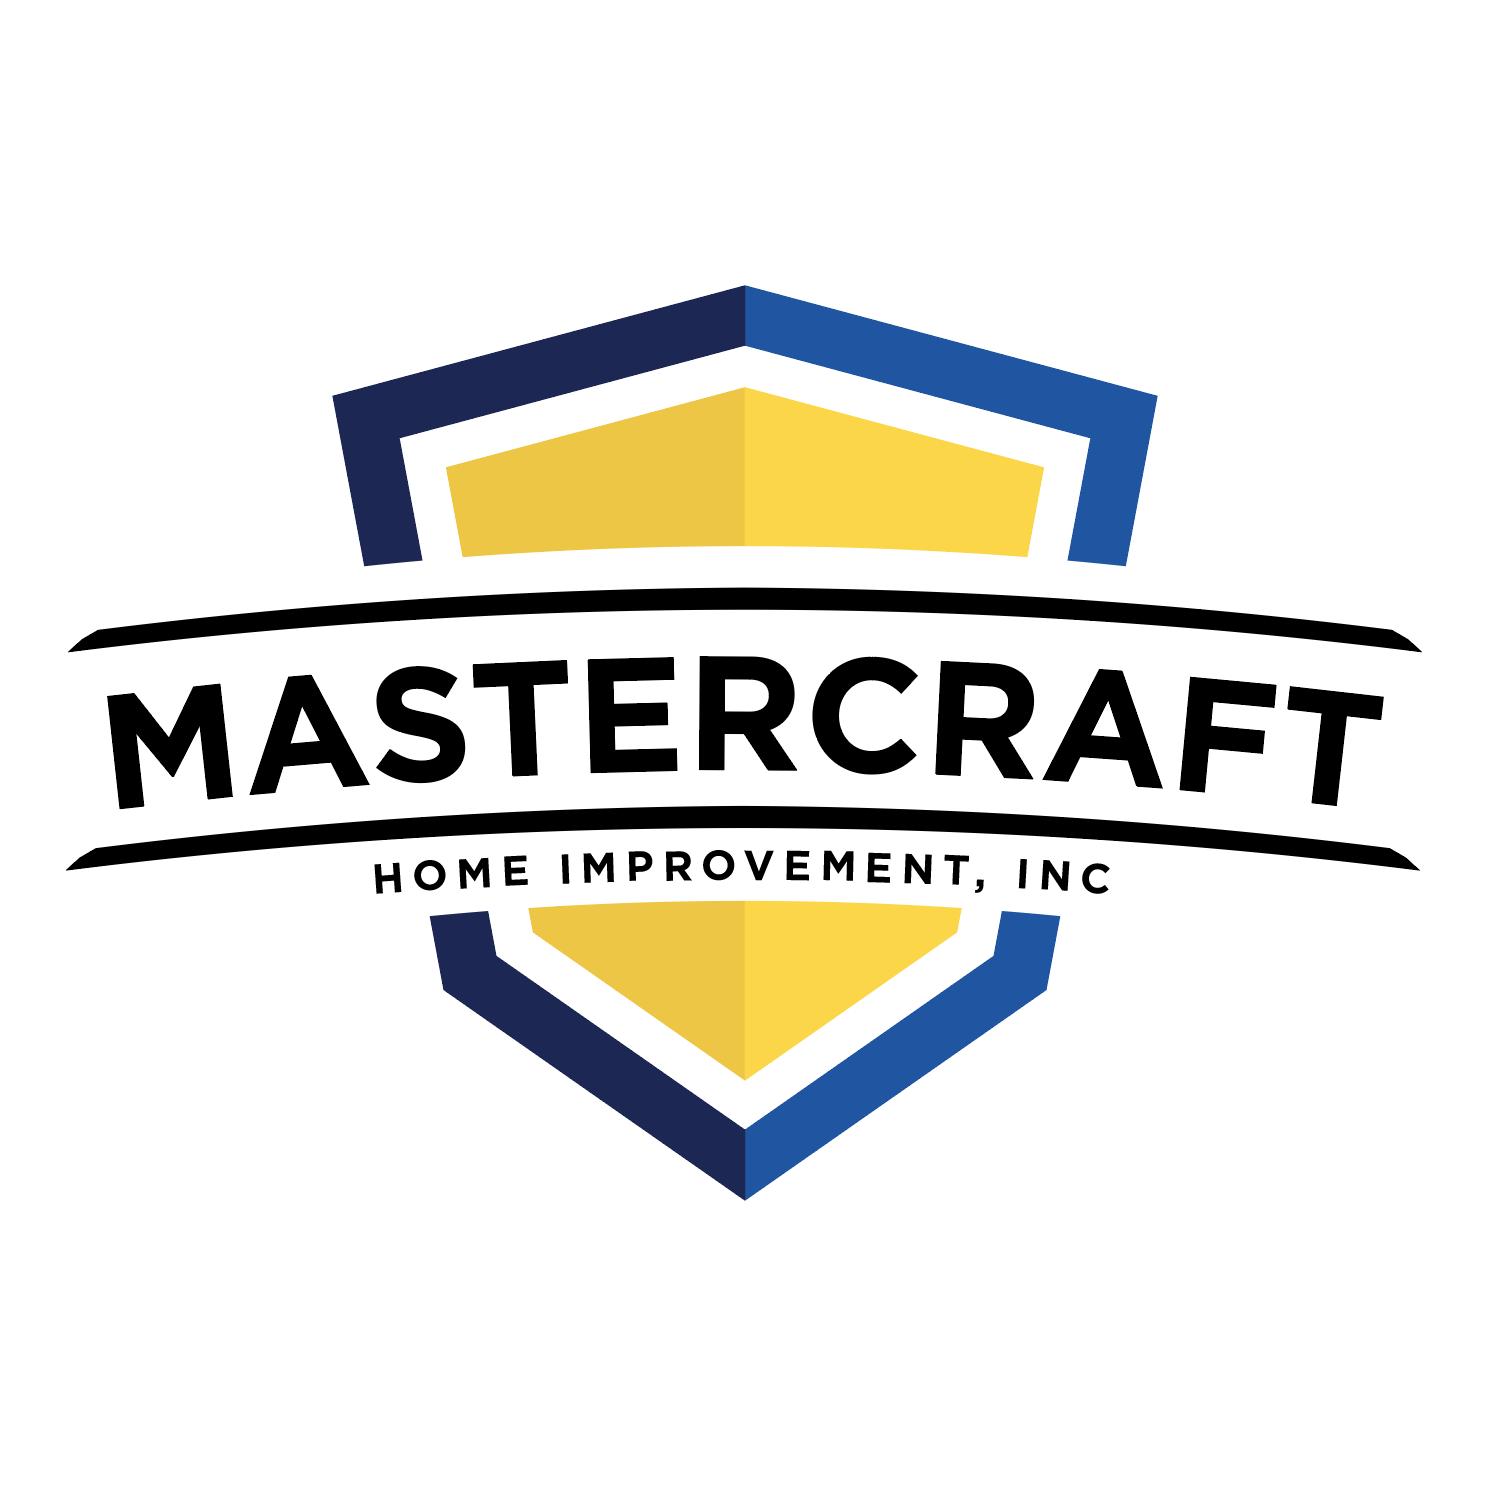 mastercraft_01.png